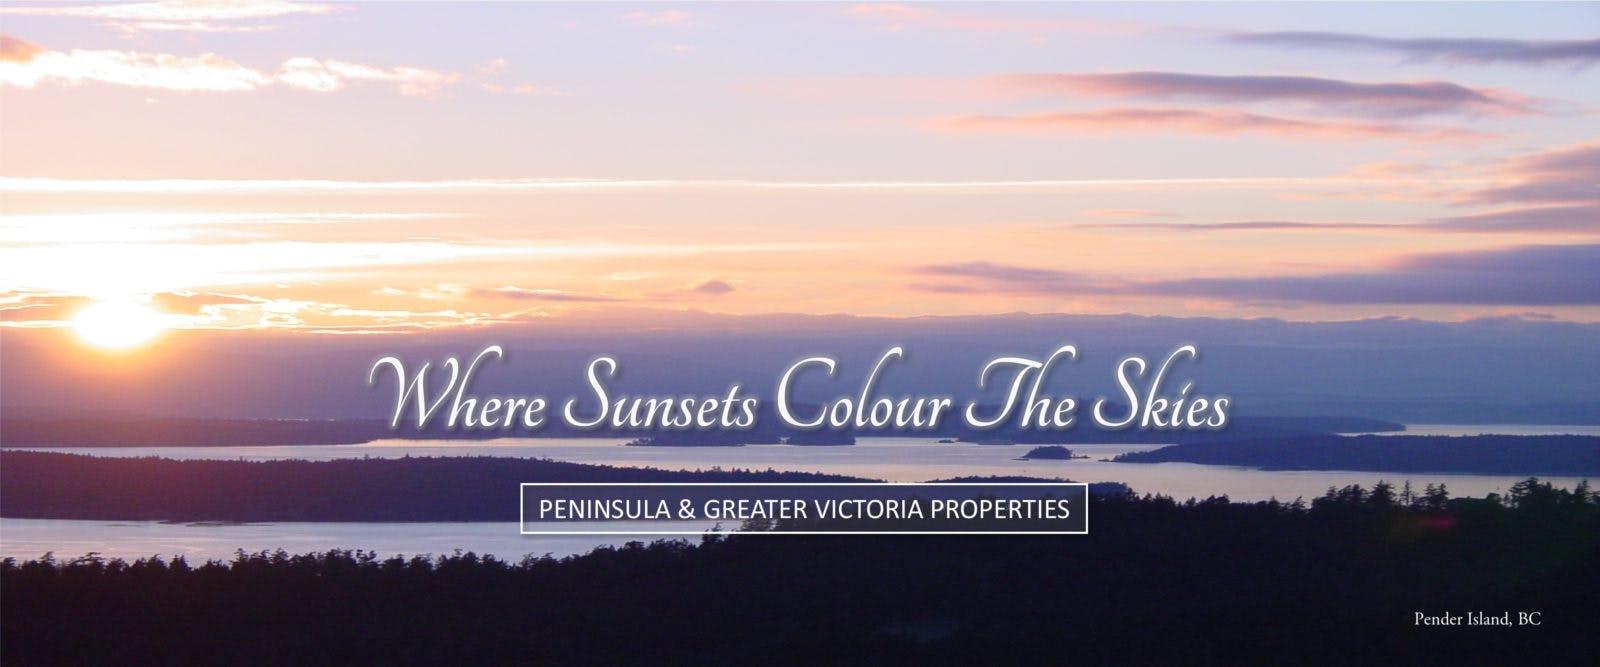 Pacifica Real Estate Inc. – Pender island BC